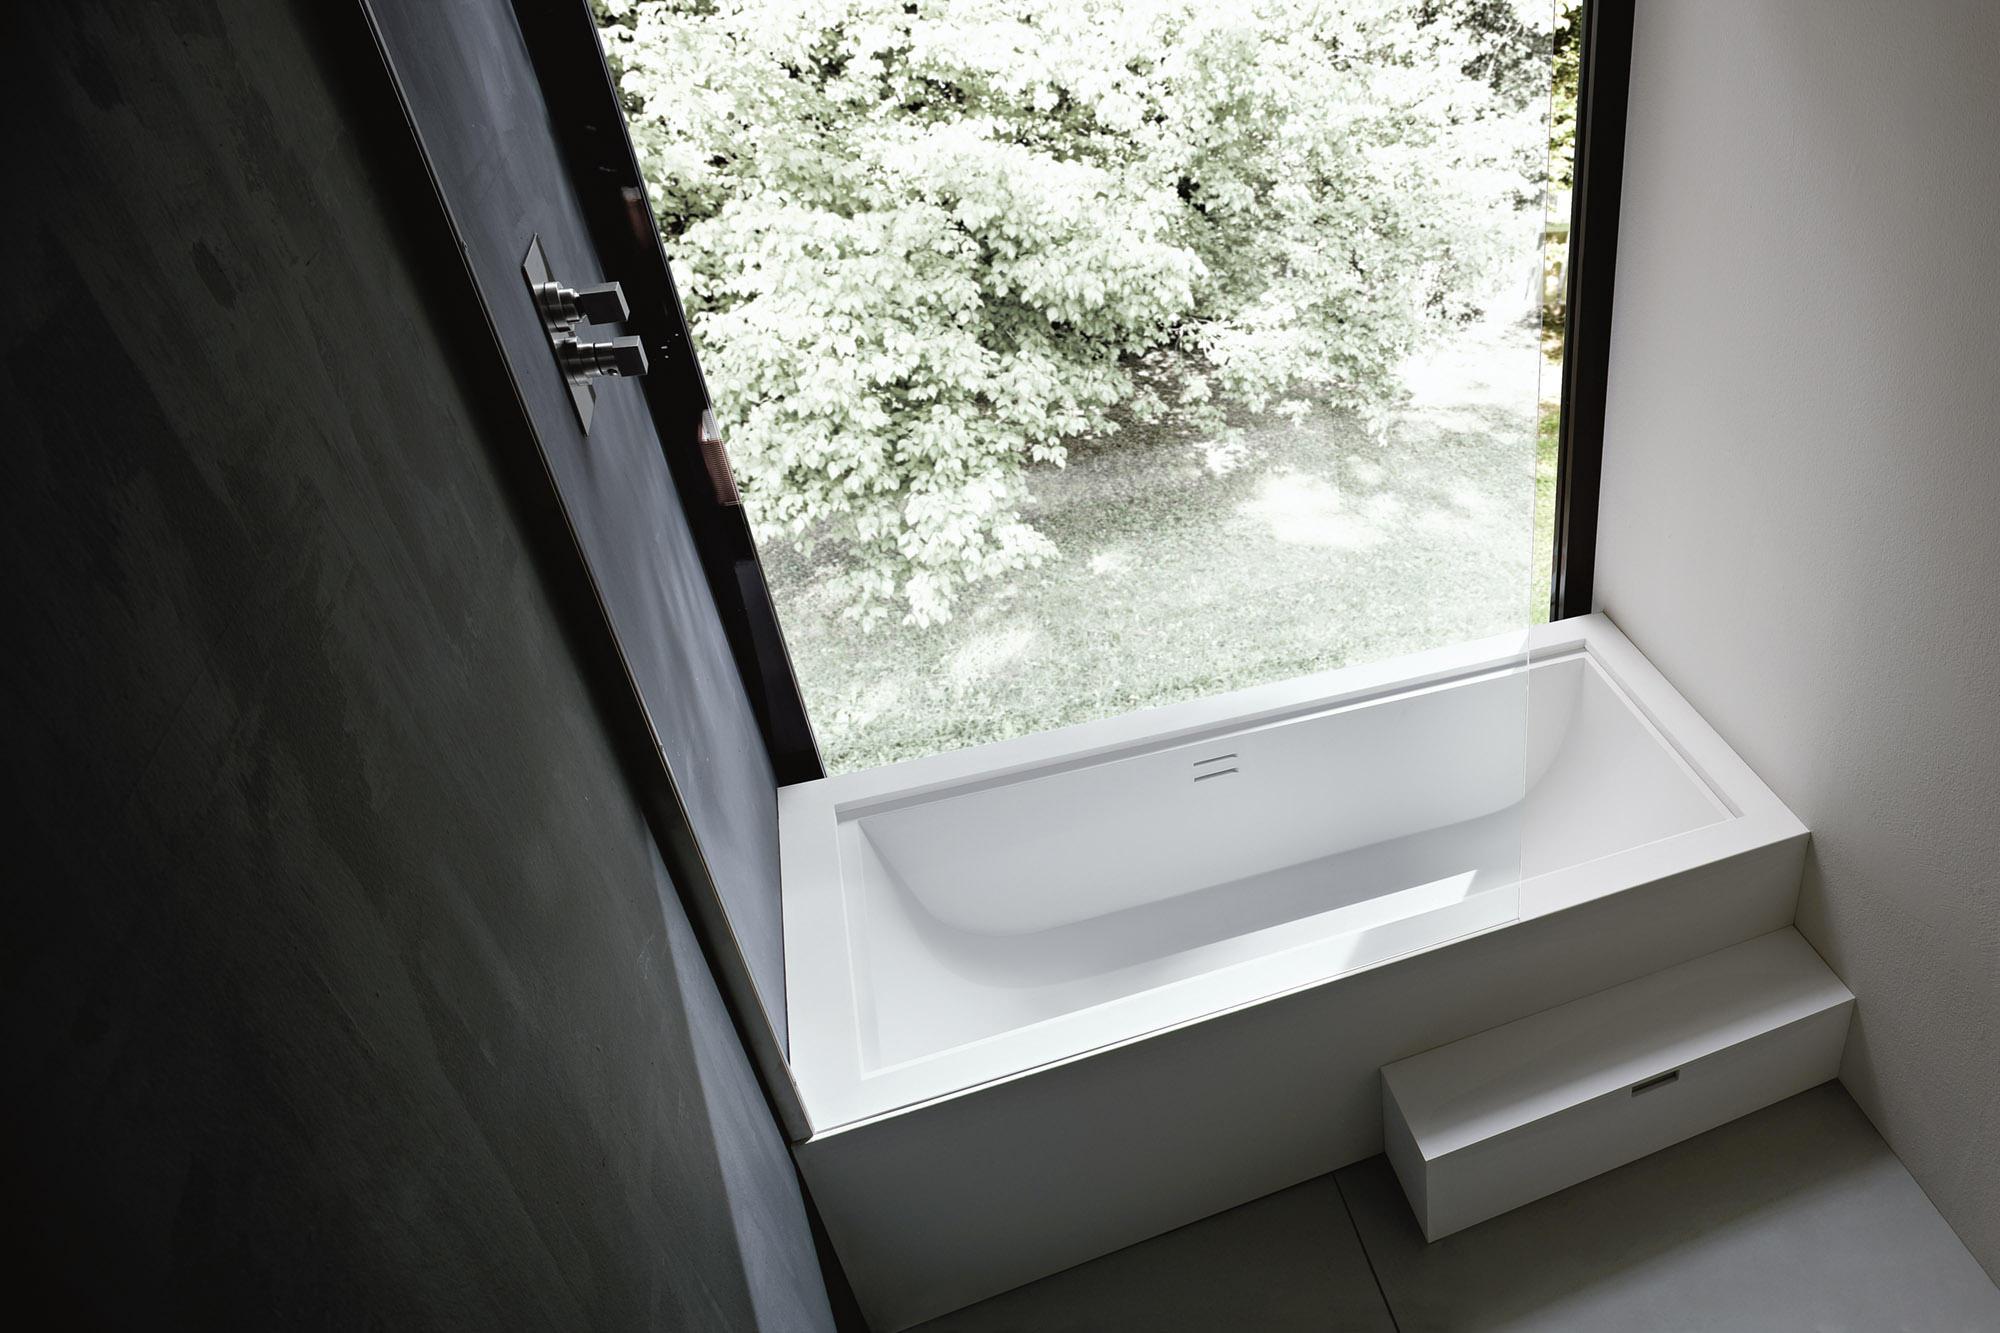 Vasca Da Bagno Con Gradini : Ideale sedia per vasca da bagno sedie da giardino